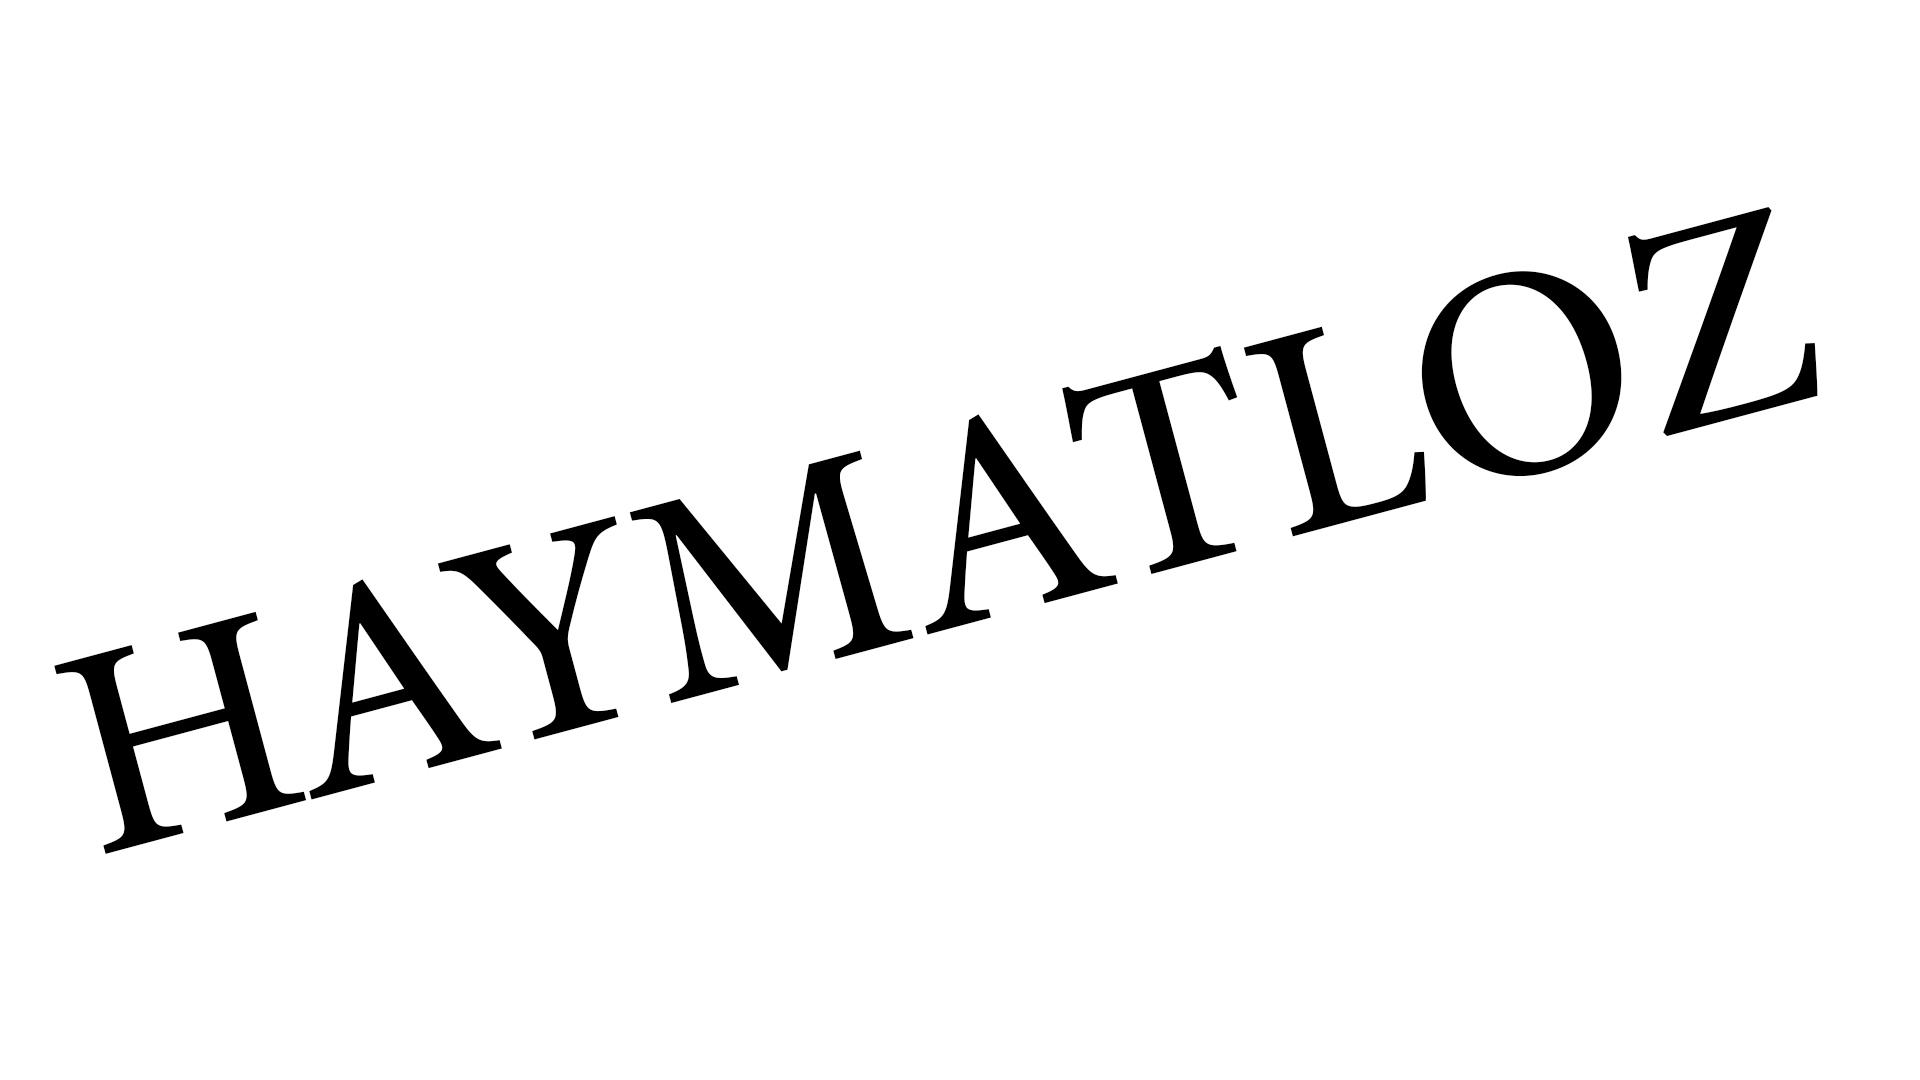 Schriftzug Haymatloz